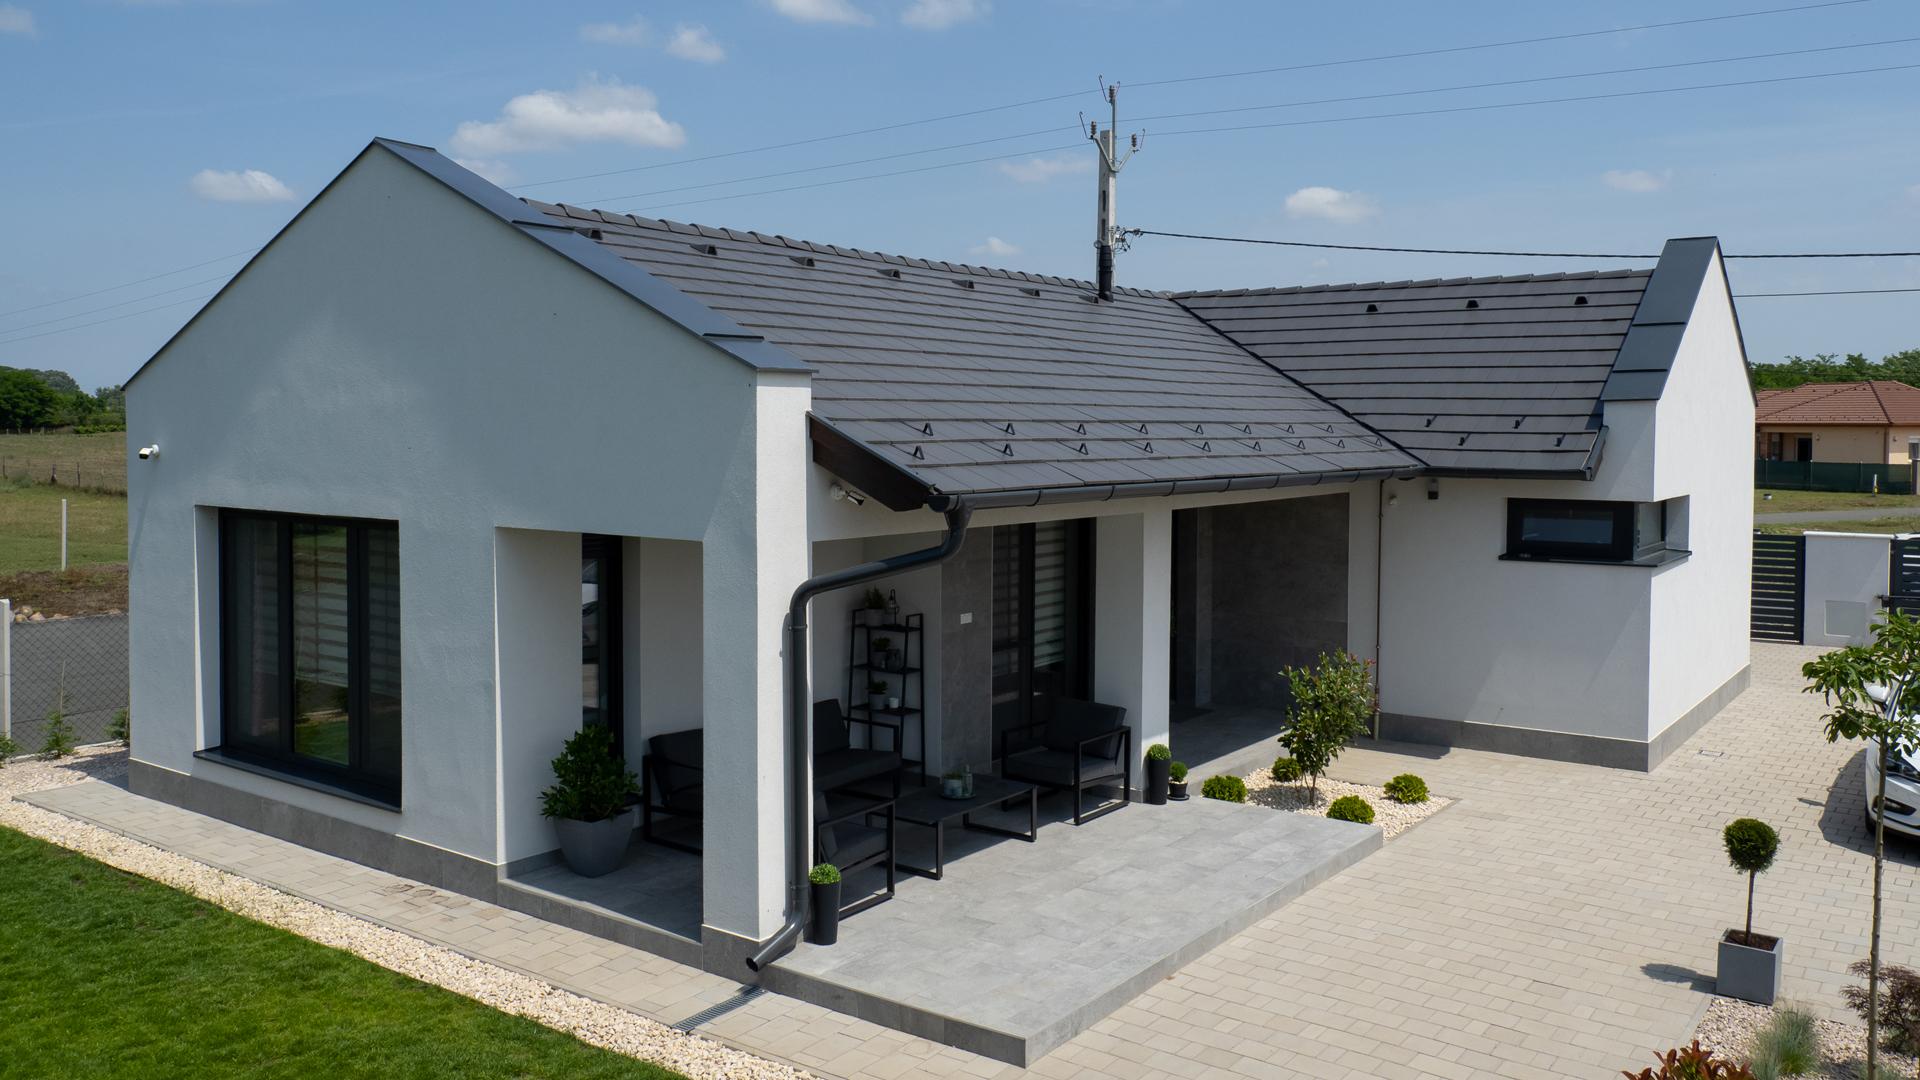 zenit-granit-referencia-2021